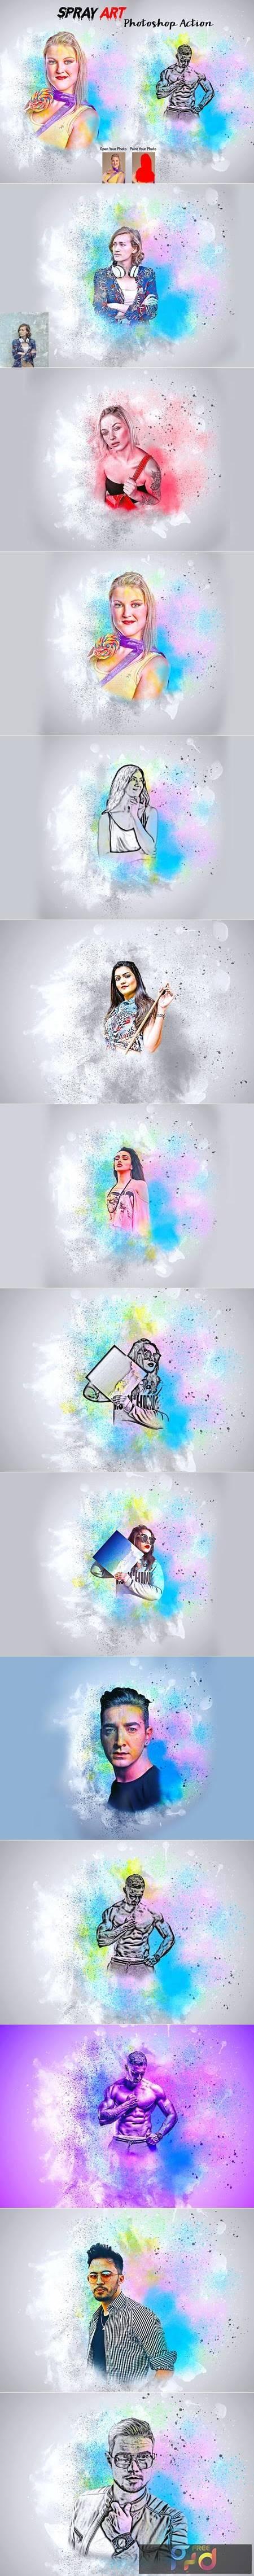 Spray Art Photoshop Action 5988838 1